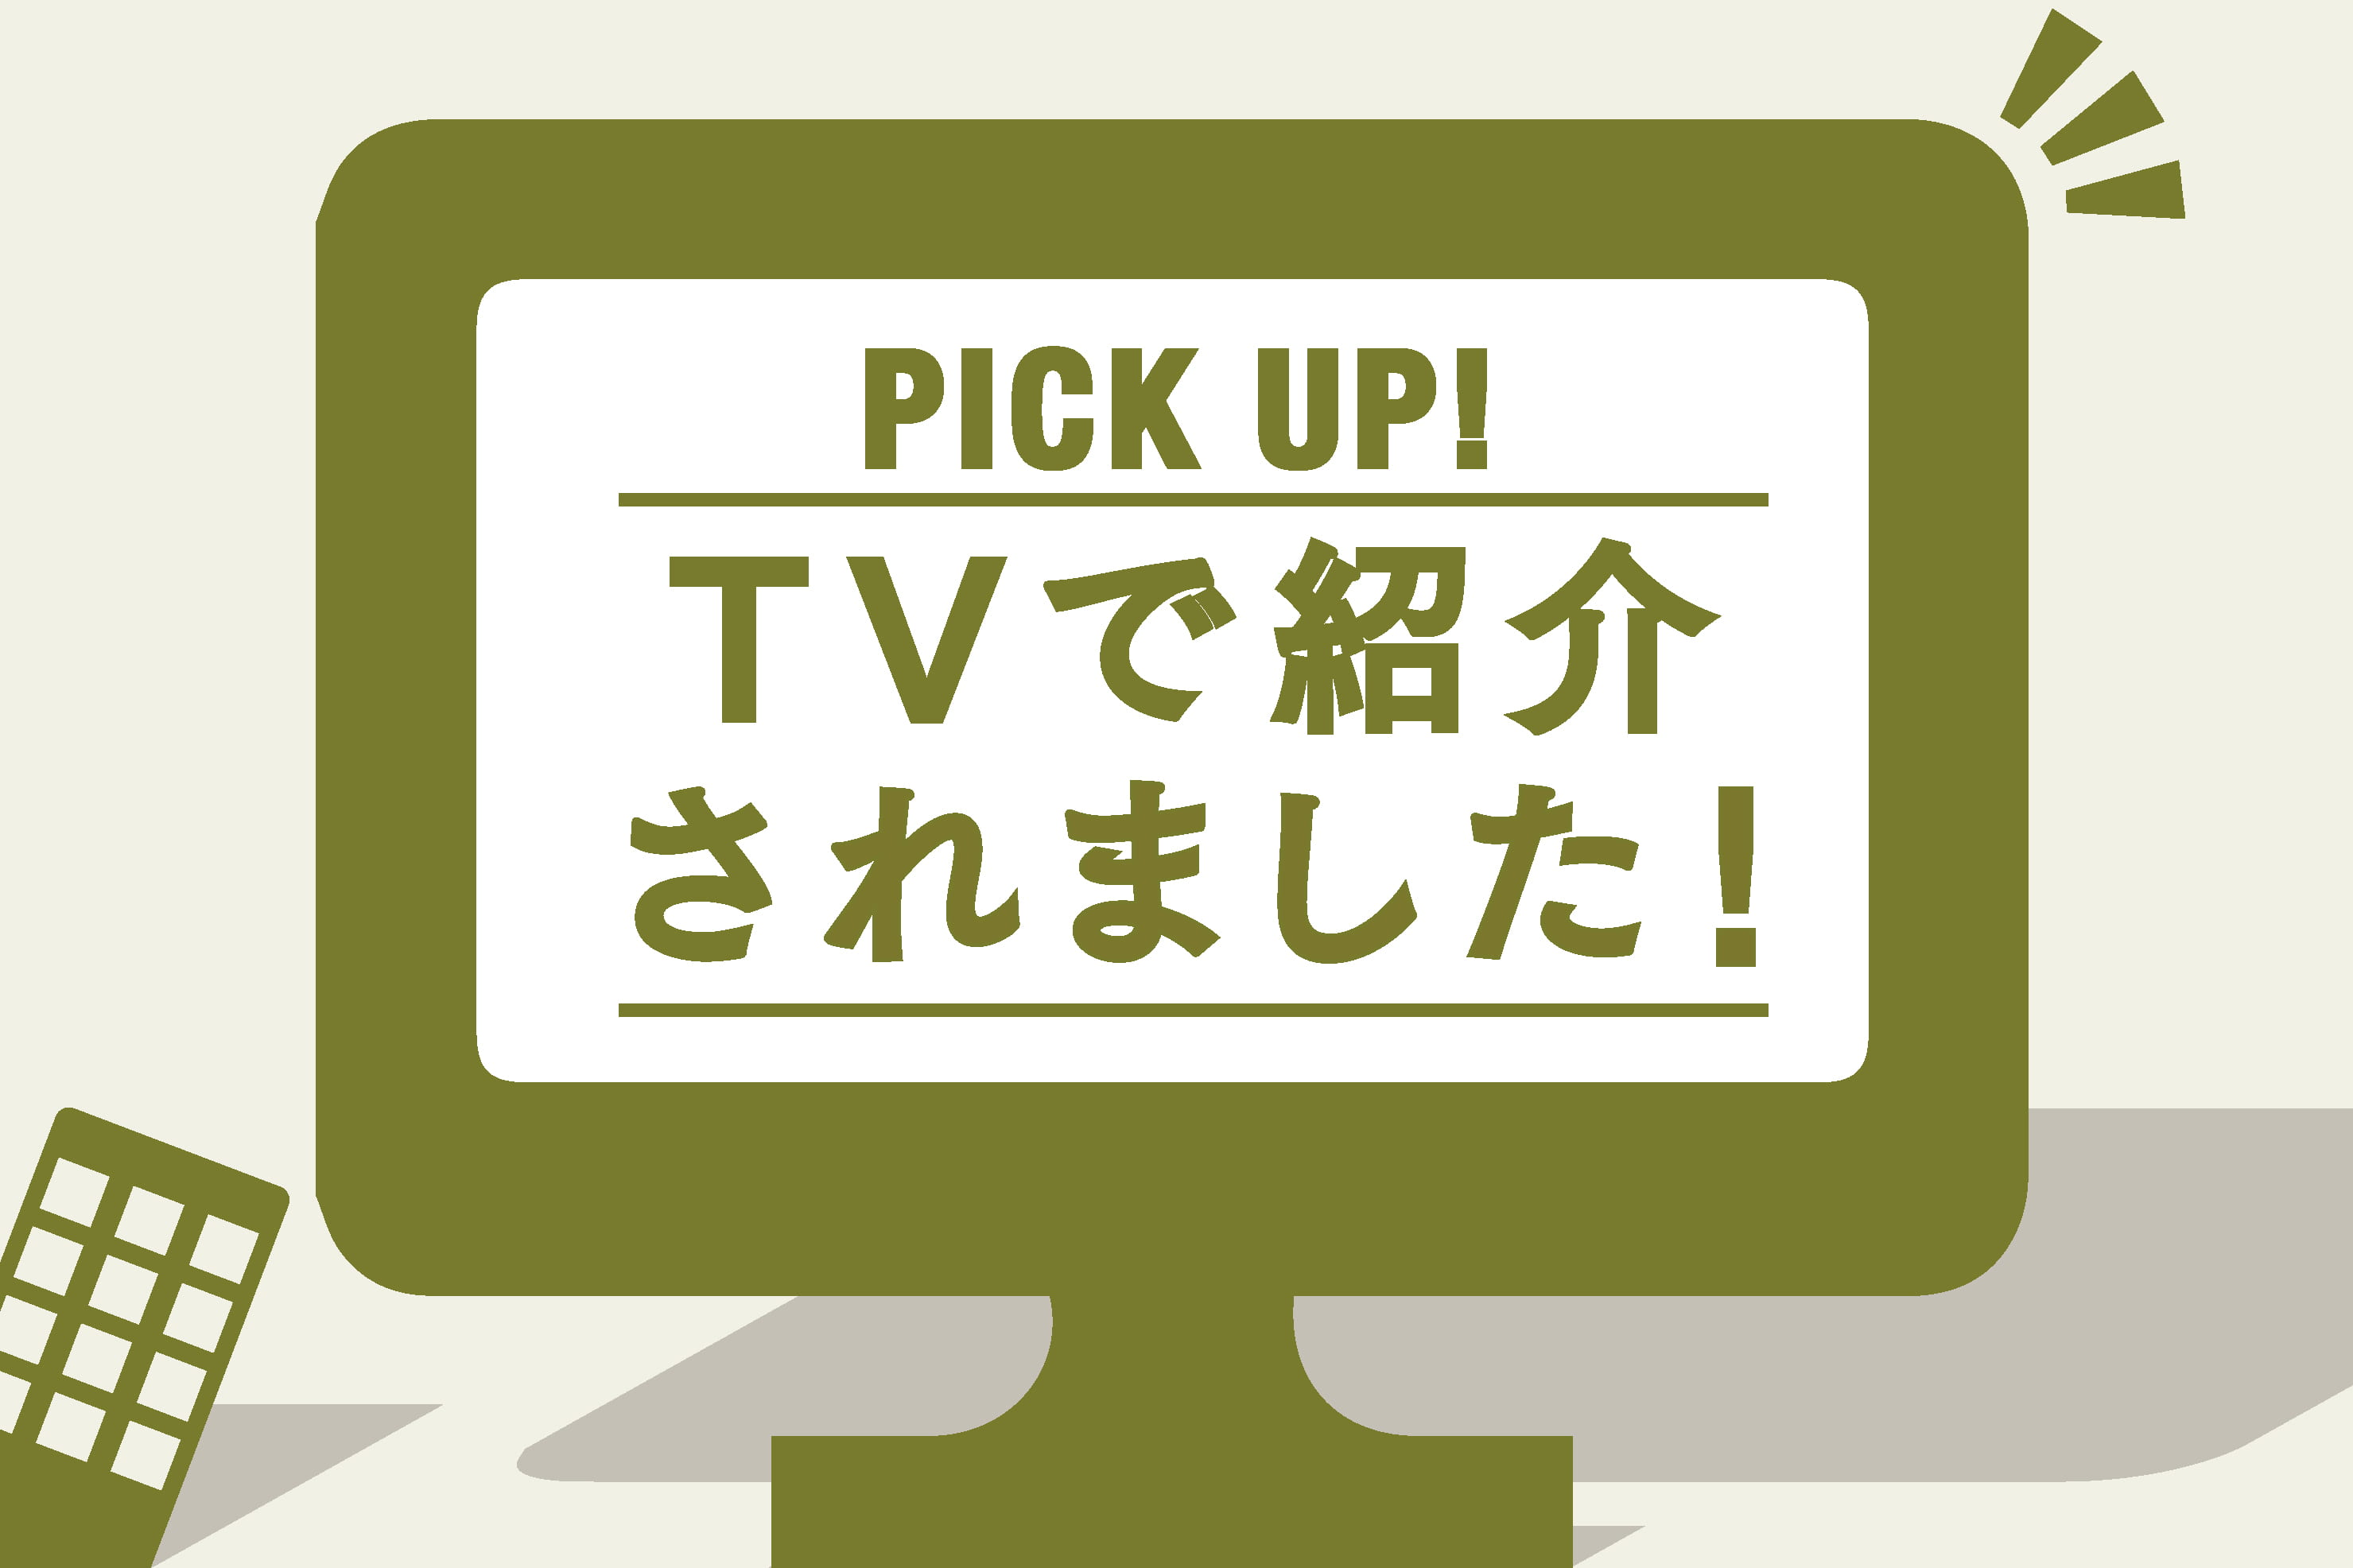 3COINS 9/19(日)放送日本テレビ系列『シューイチ』で紹介された商品一覧はコチラ!